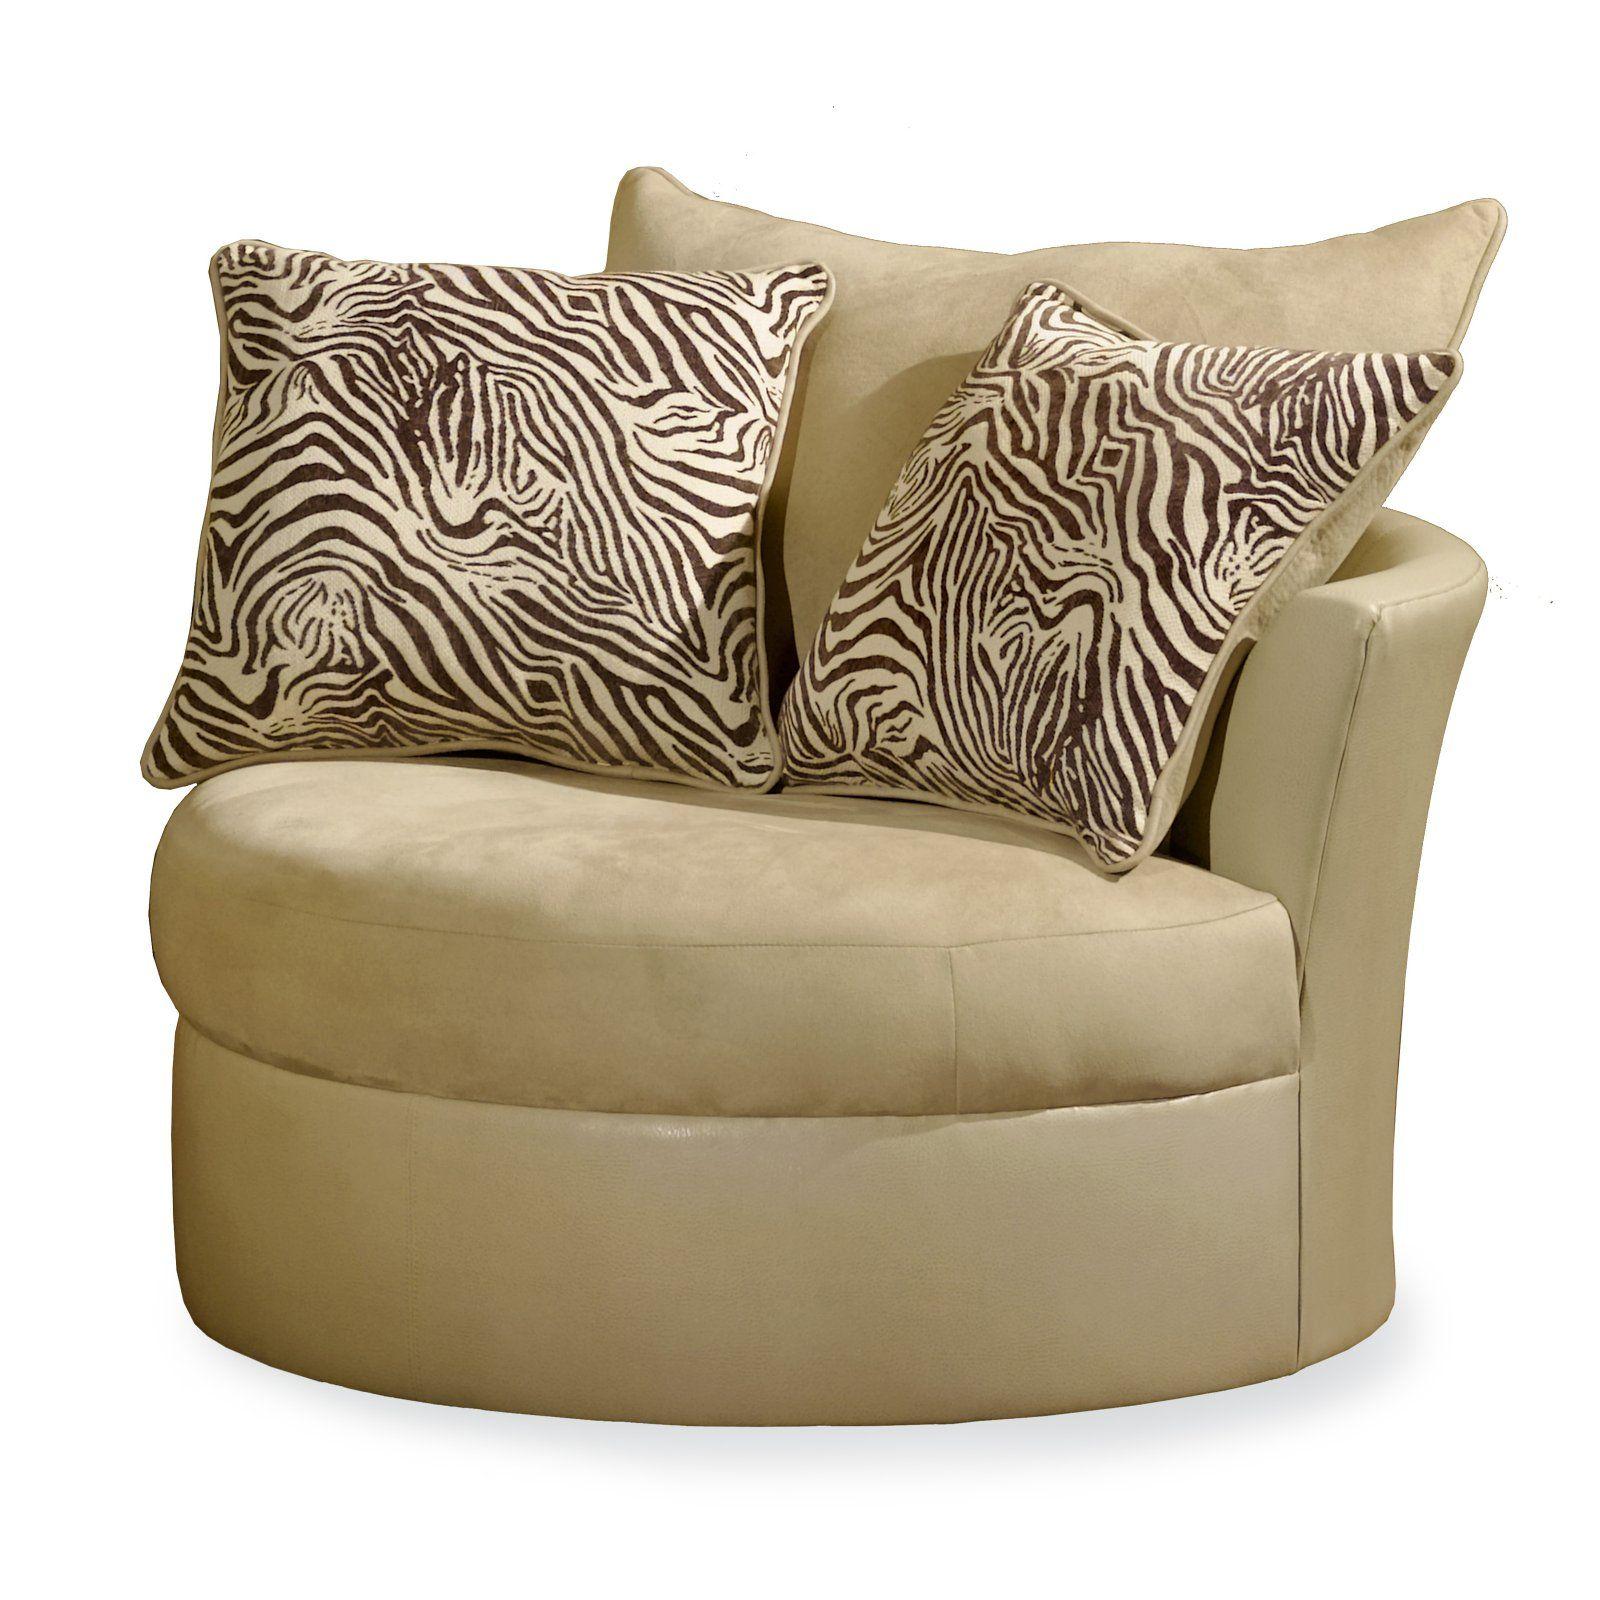 Zebra Chaise Lounge Chair  Sitting Room  Pinterest  Chaise New Bedroom Chaise Lounge Chairs Inspiration